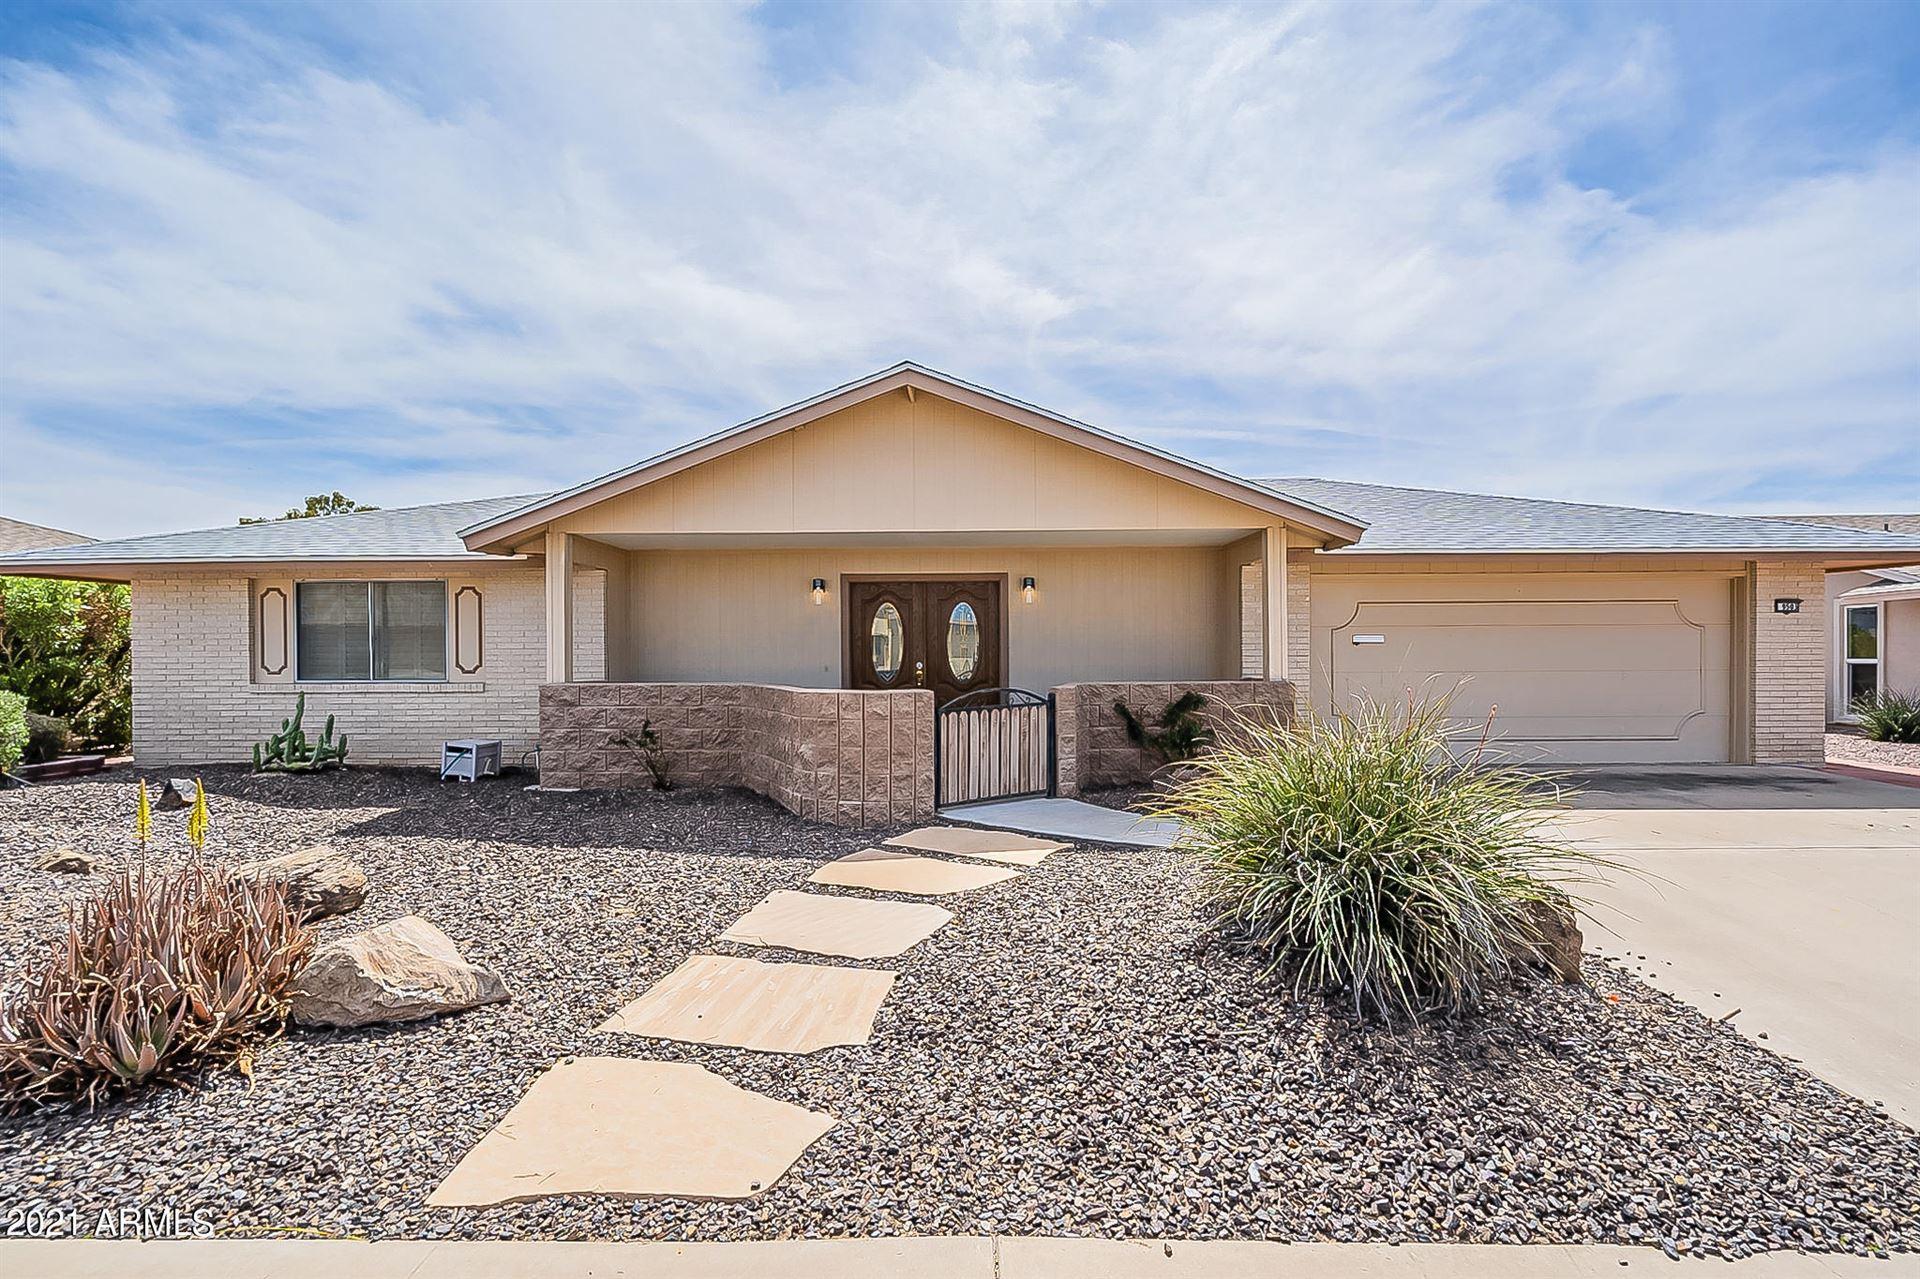 9503 W Glen Oaks Circle, Sun City, AZ 85351 - MLS#: 6214373